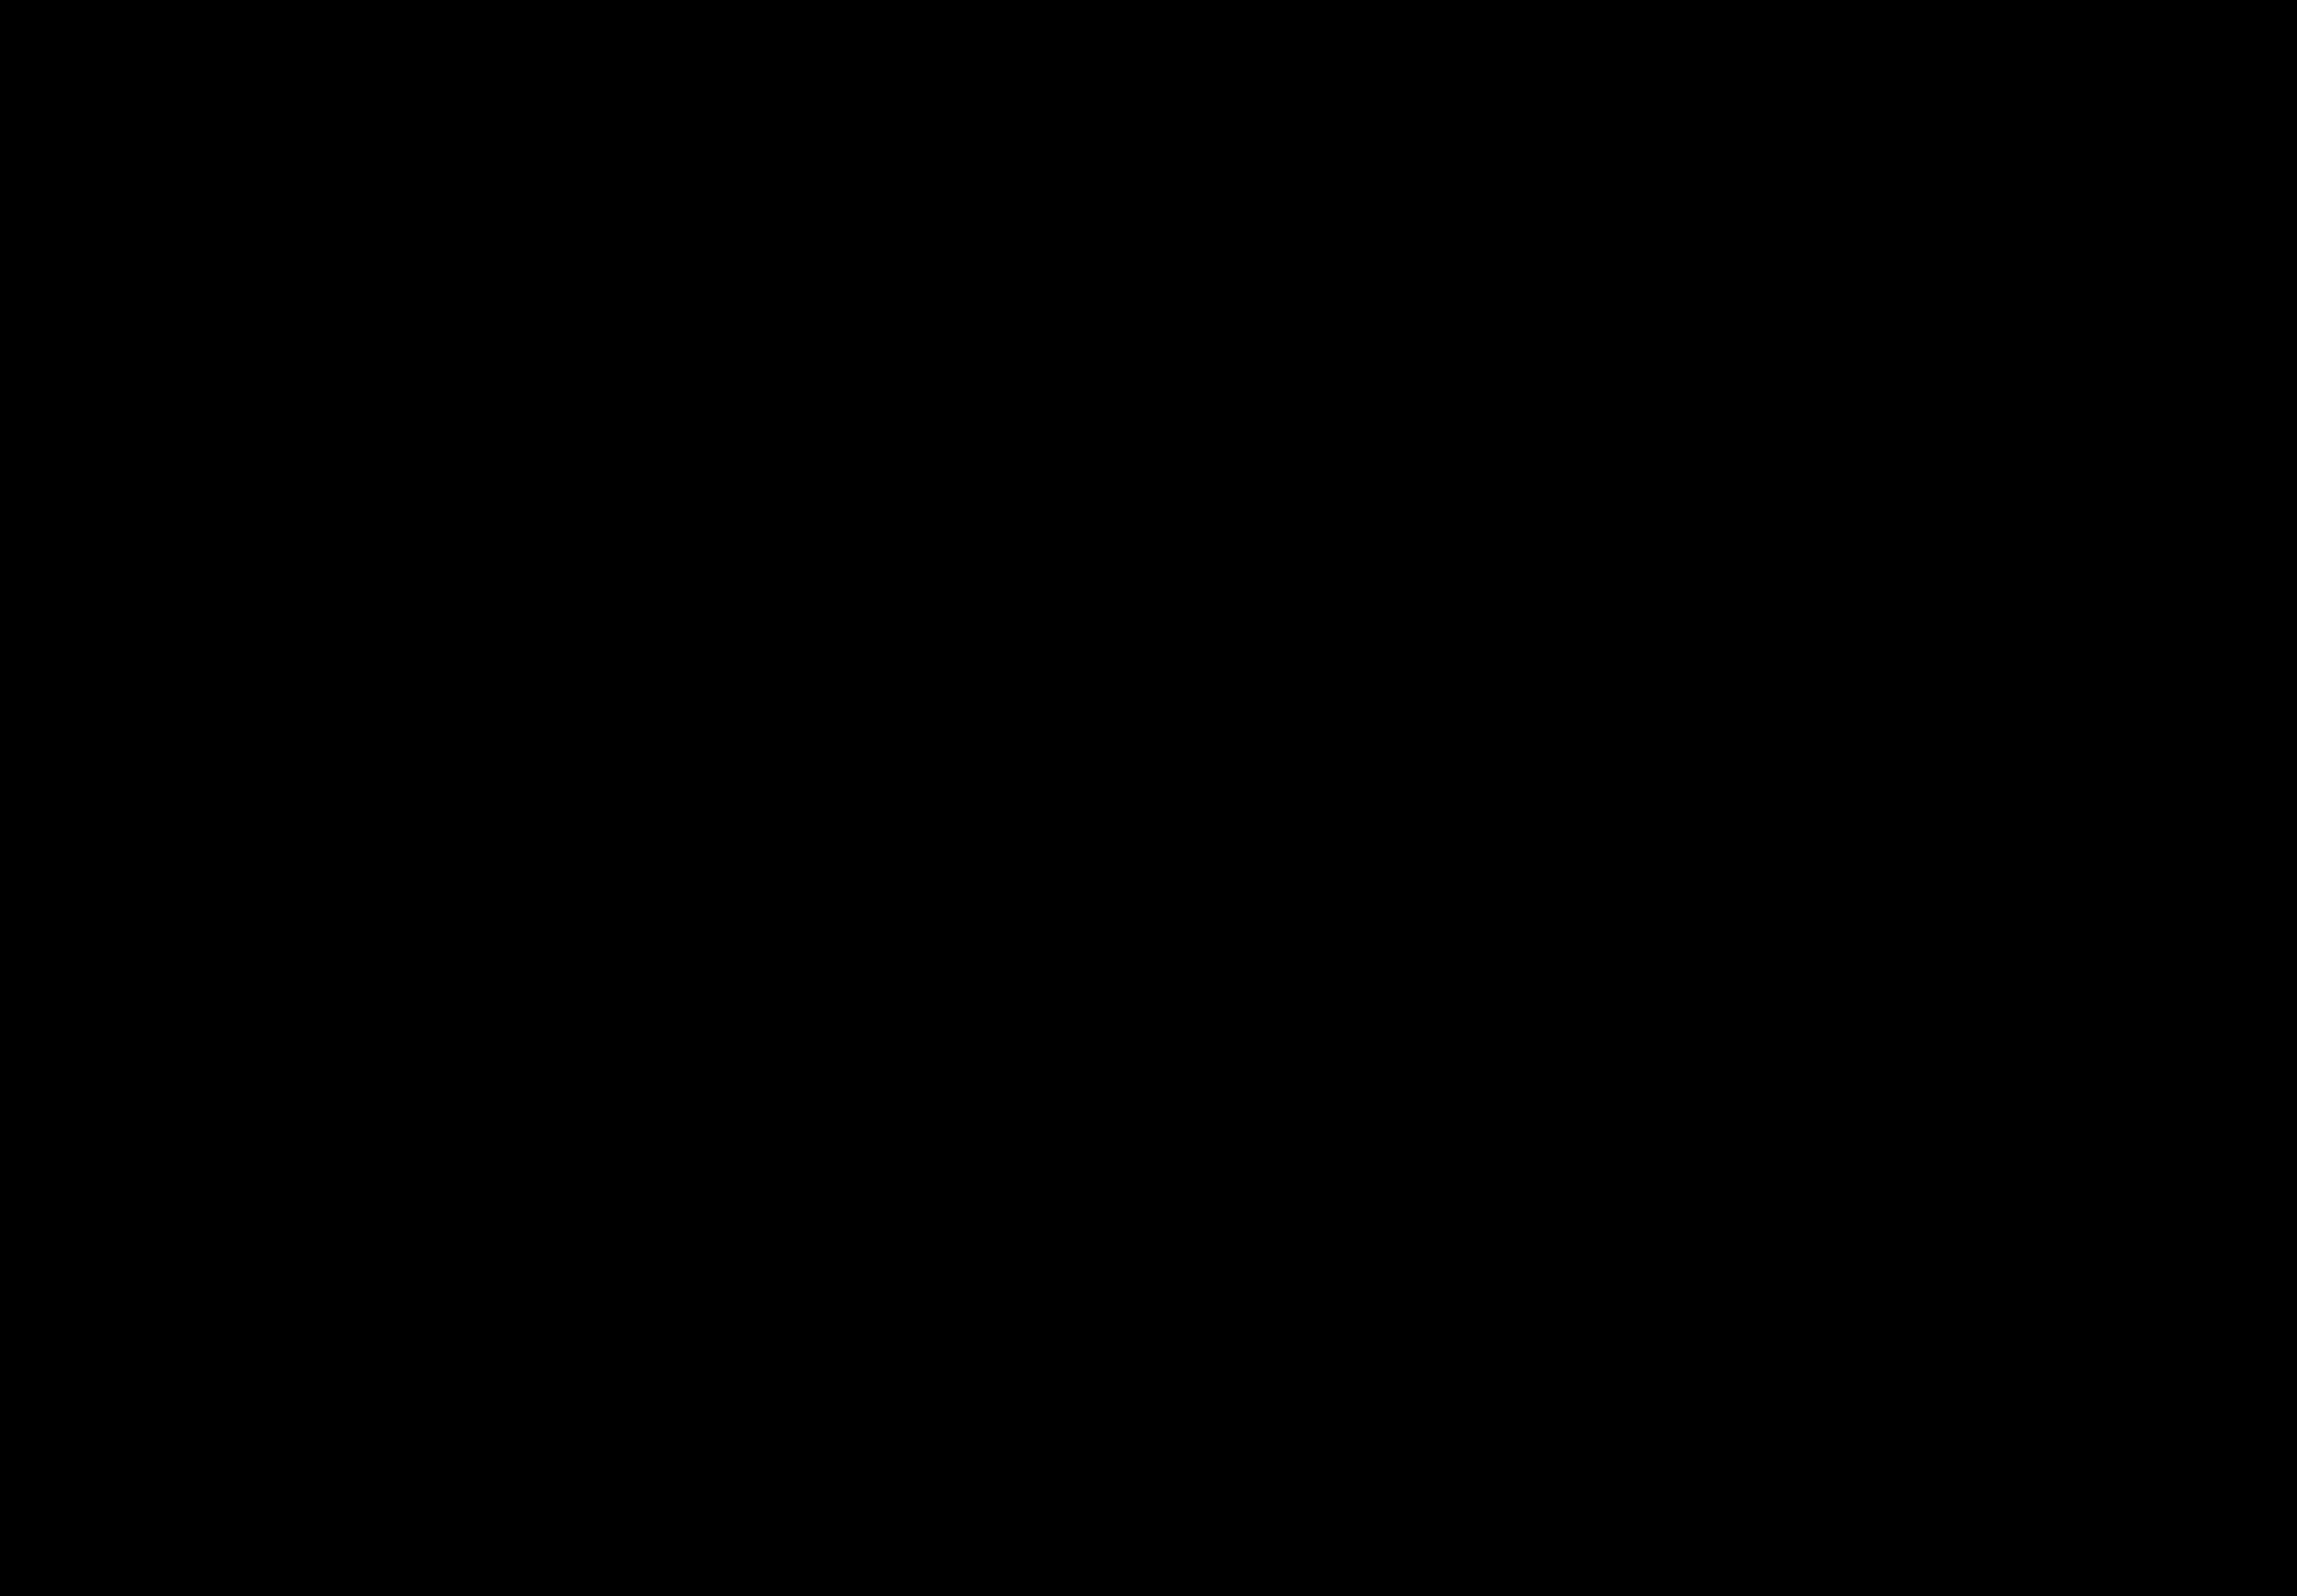 Horse silhouette big image. Race clipart animal race